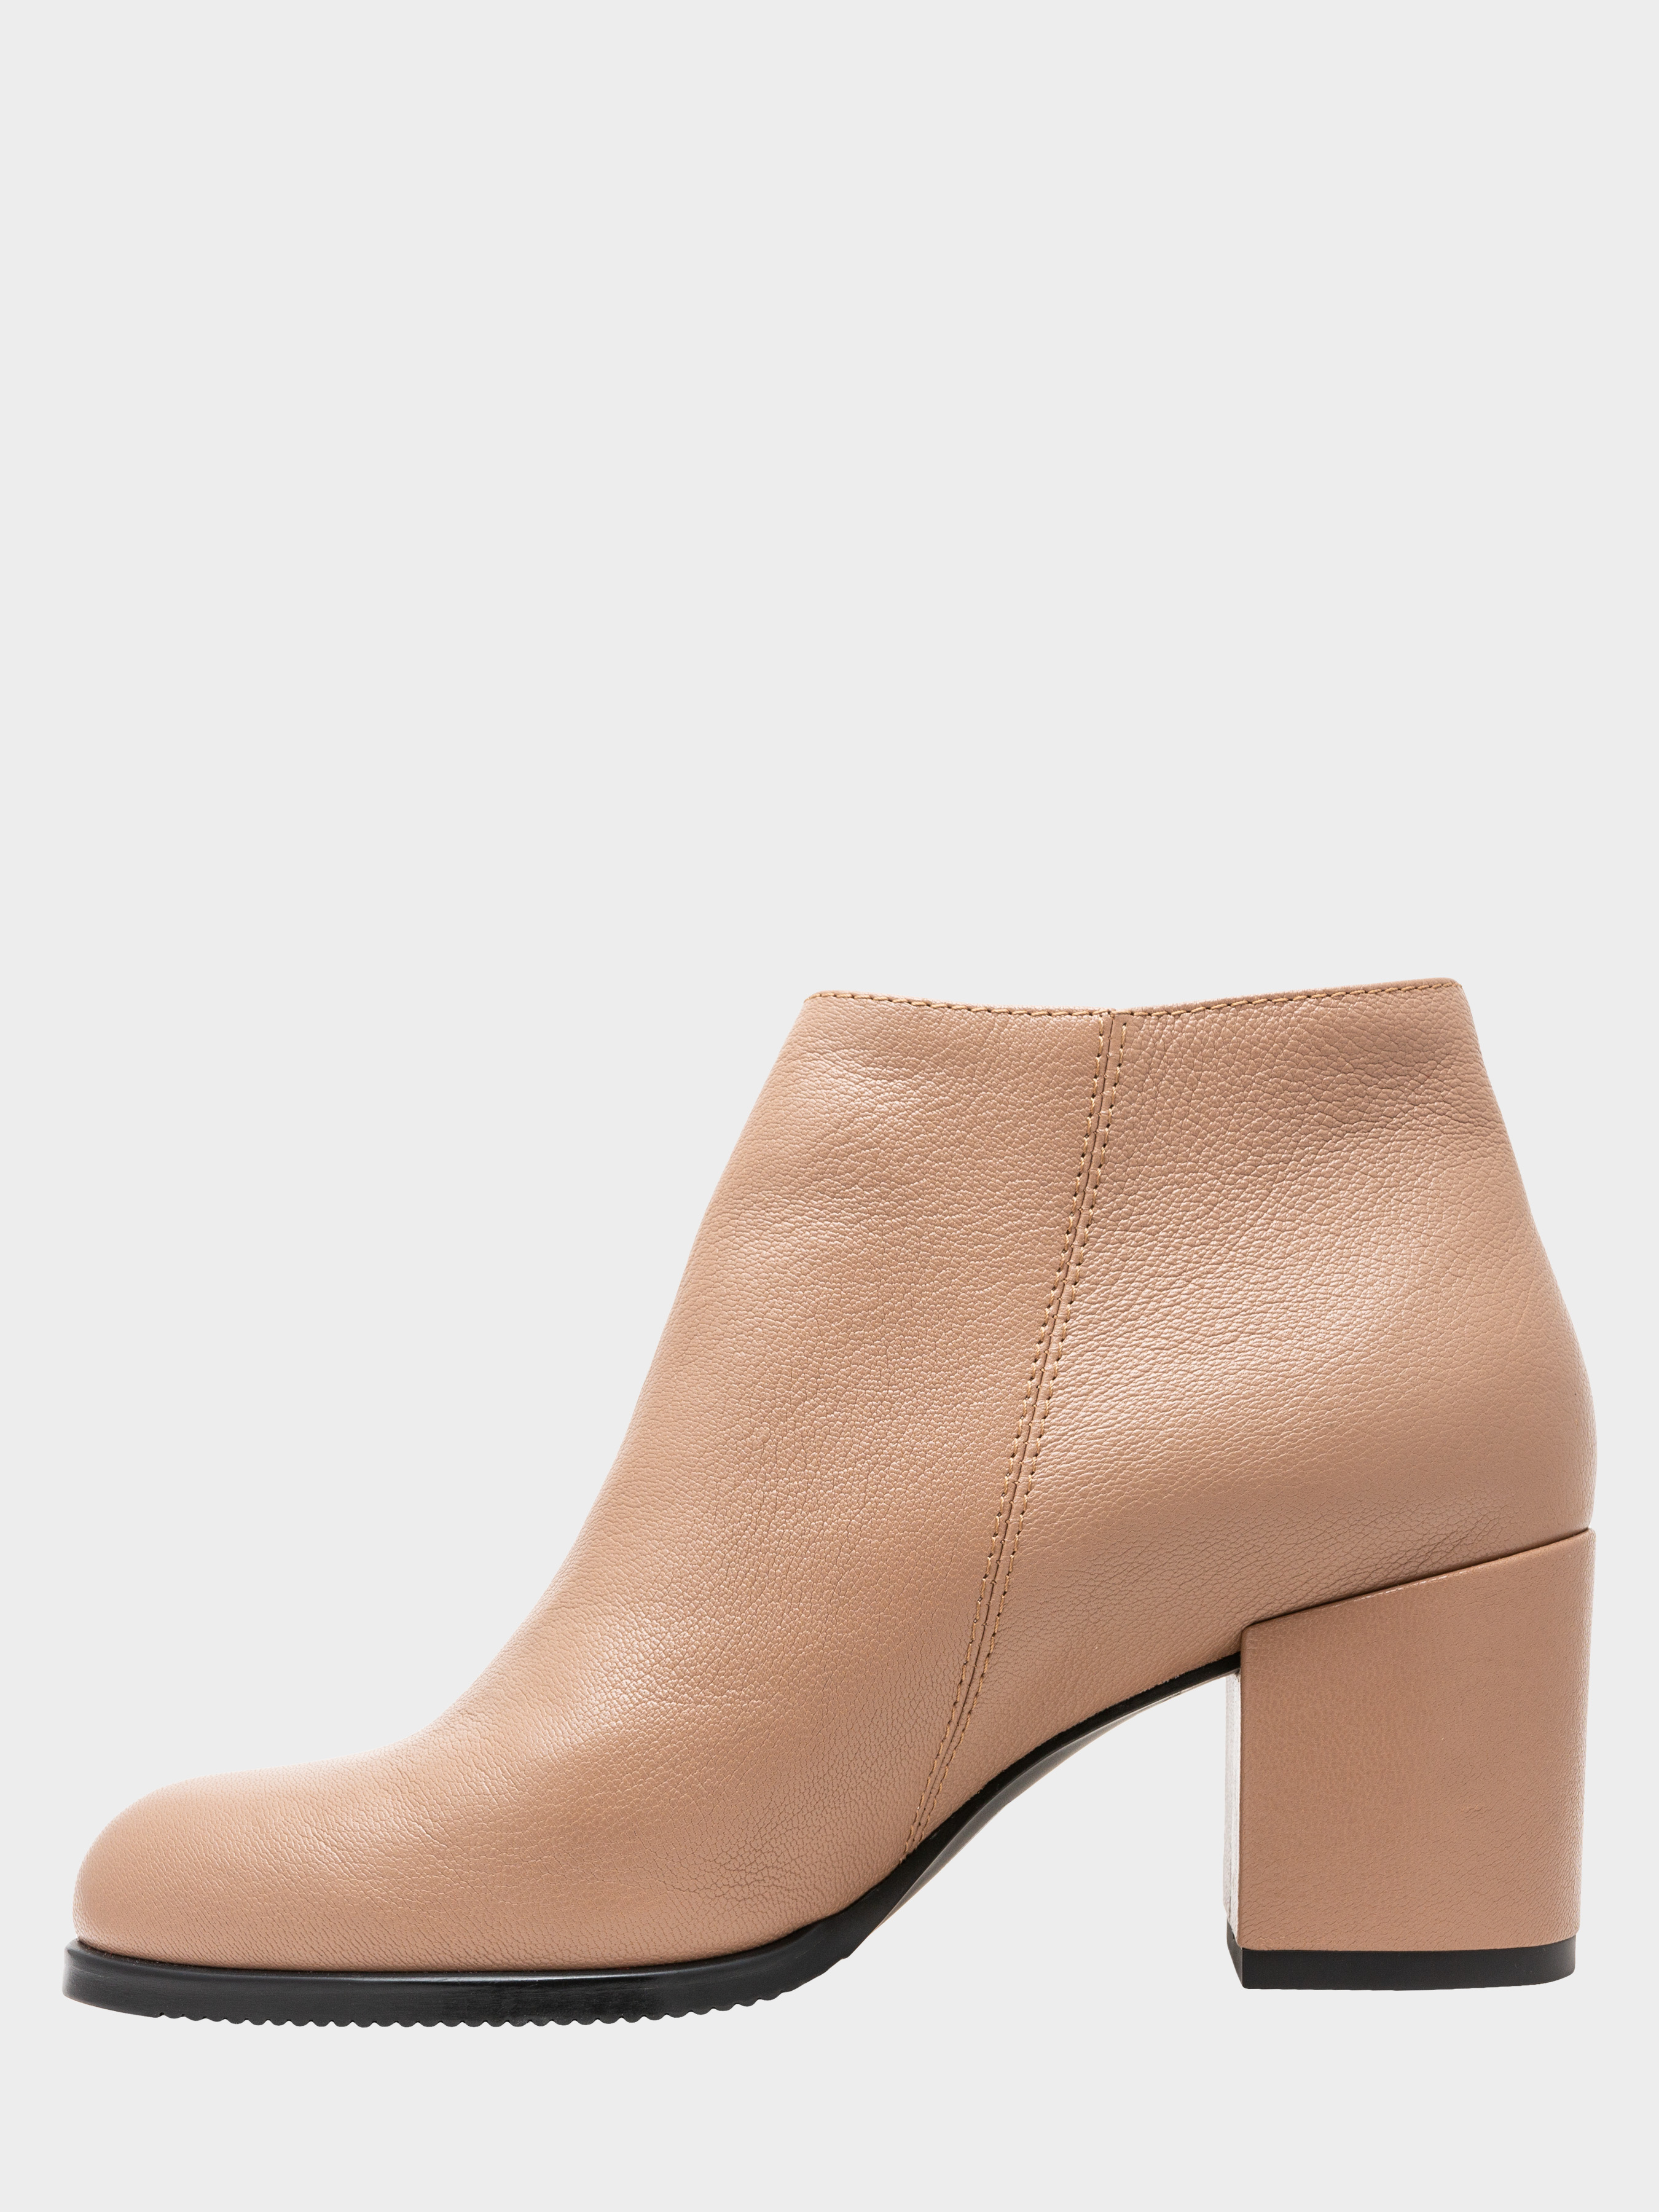 Ботинки для женщин Ботинки женские ENZO VERRATTI 18-1270-4-1be примерка, 2017